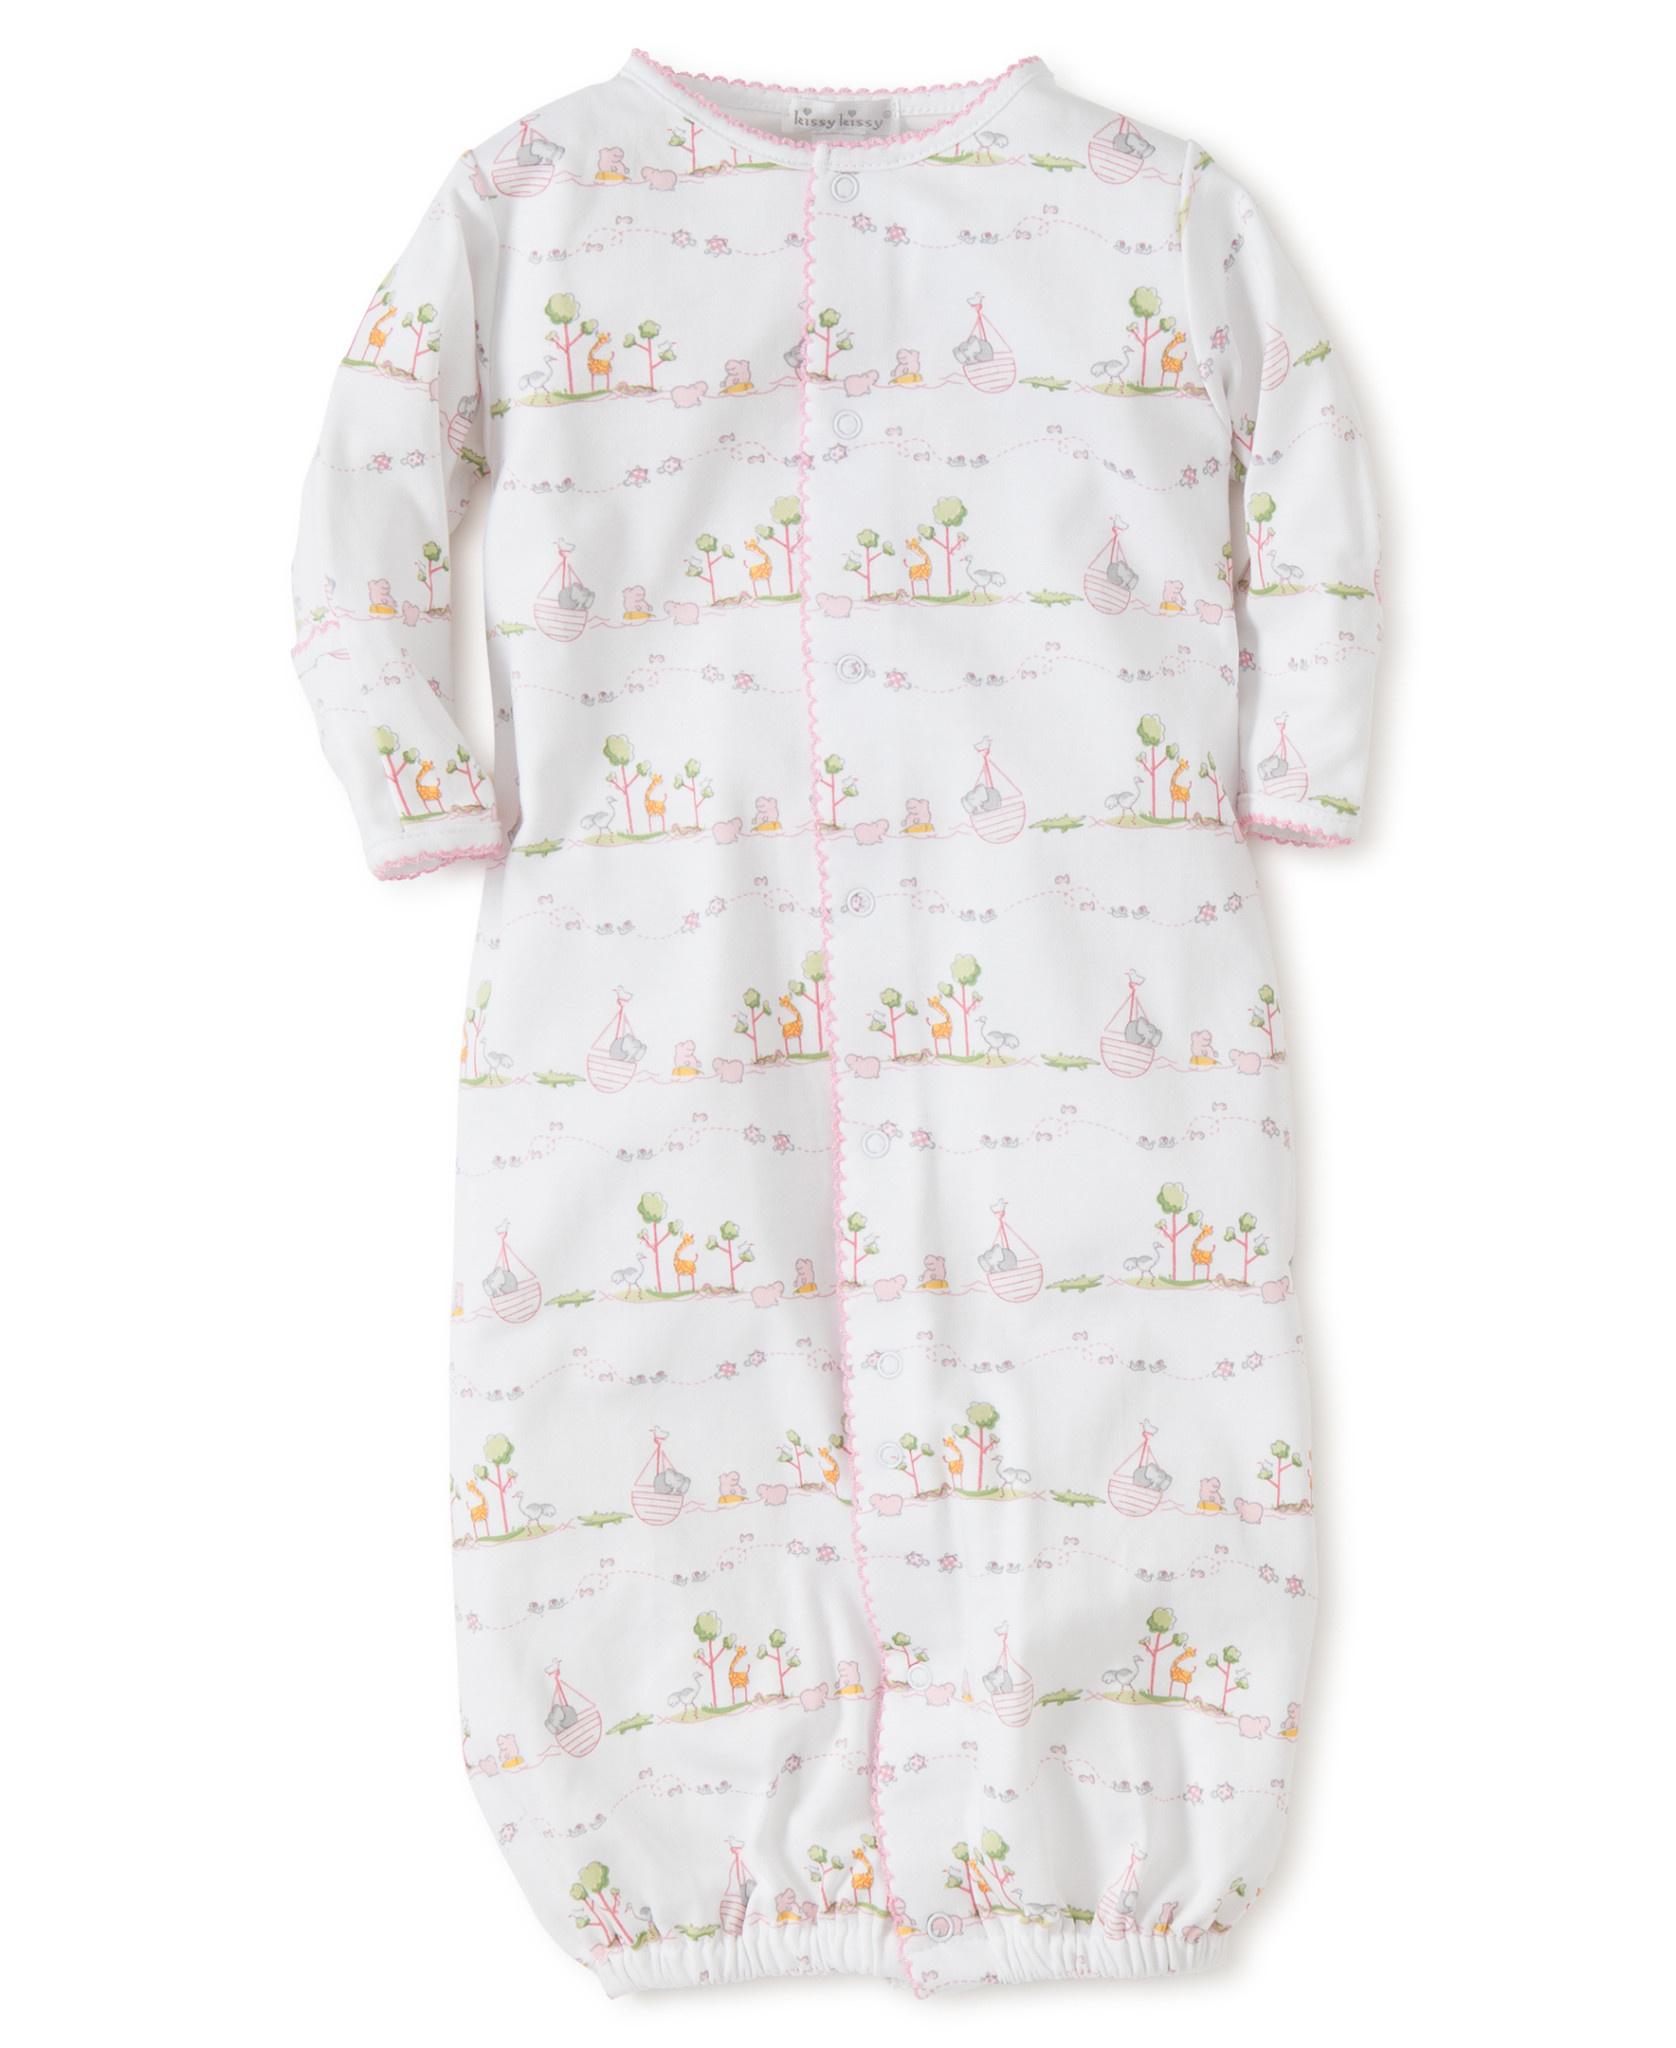 Kissy Kissy Noah's Print Converter Gown Pink